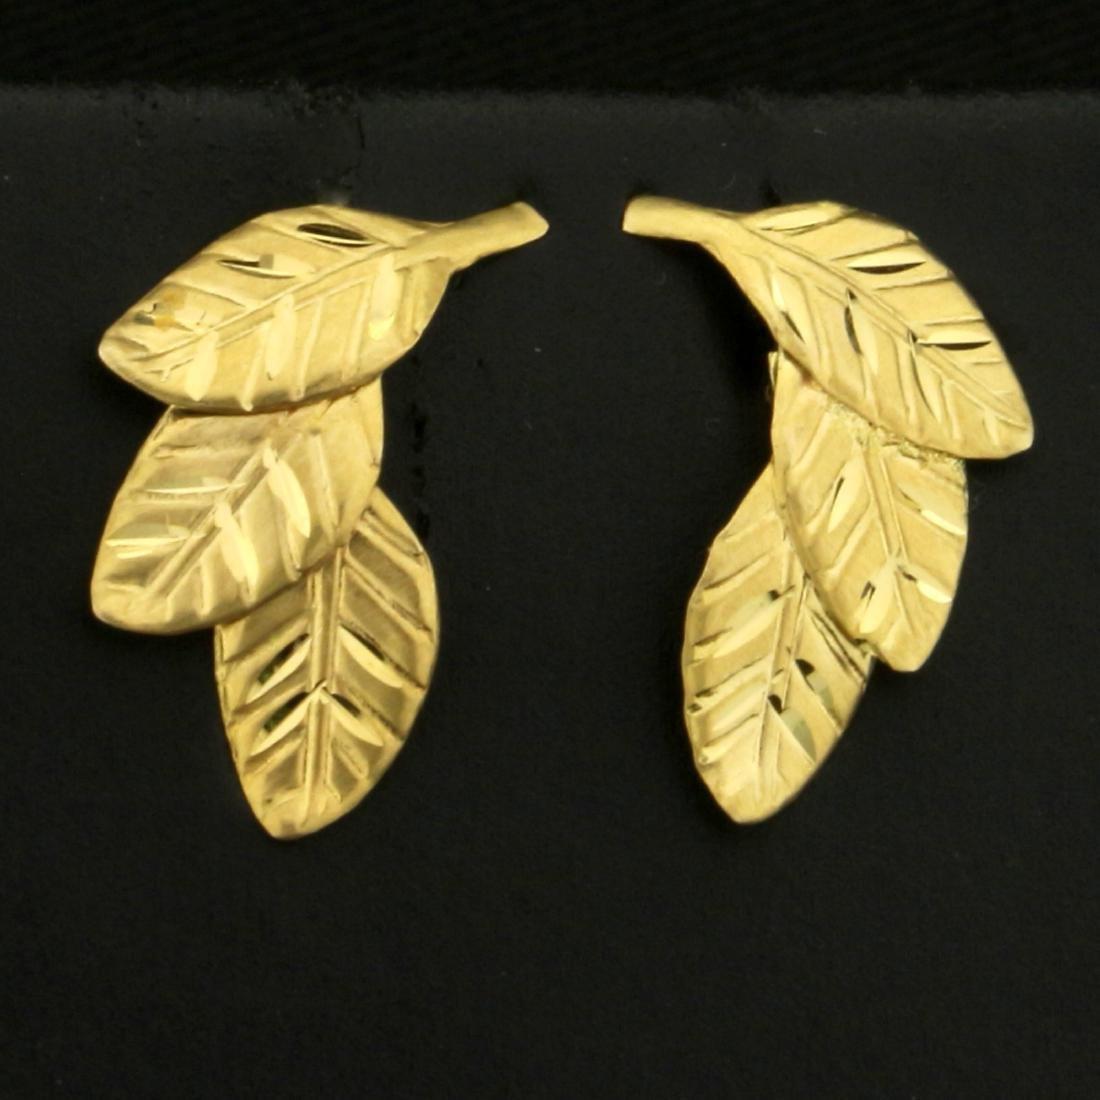 Diamond Cut Leaf Nature Earrings in 14K Yellow Gold